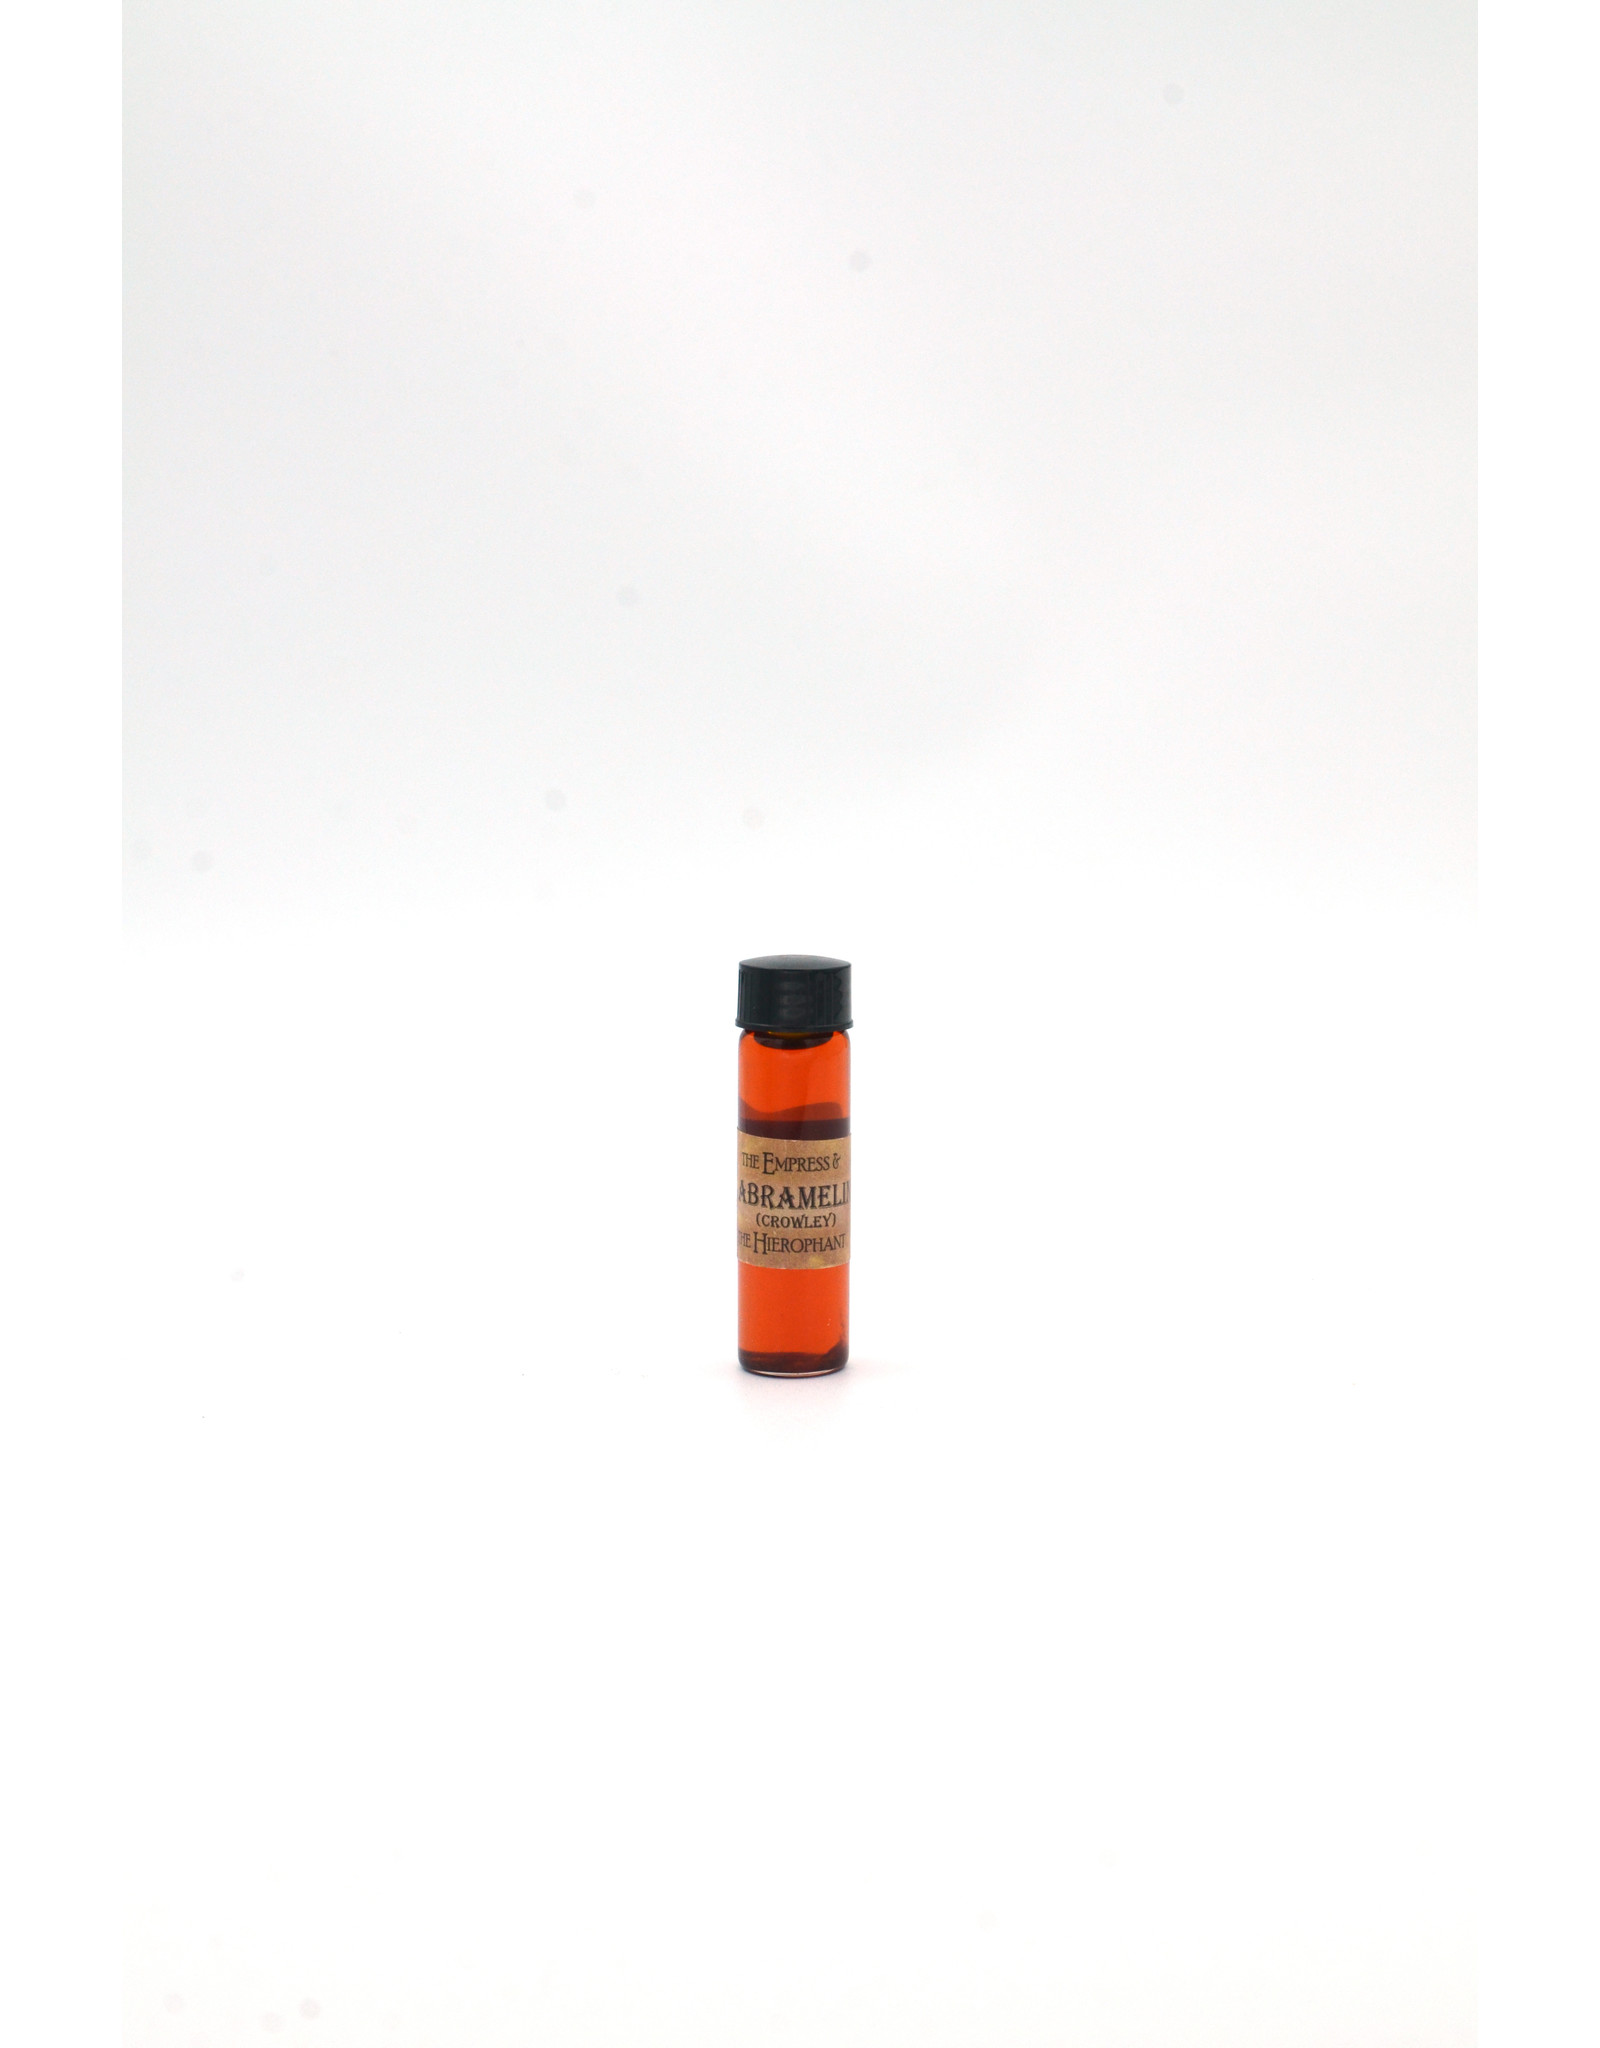 Abramelin Magickal Oil (Crowley Recipe) 2 Dram Bottle